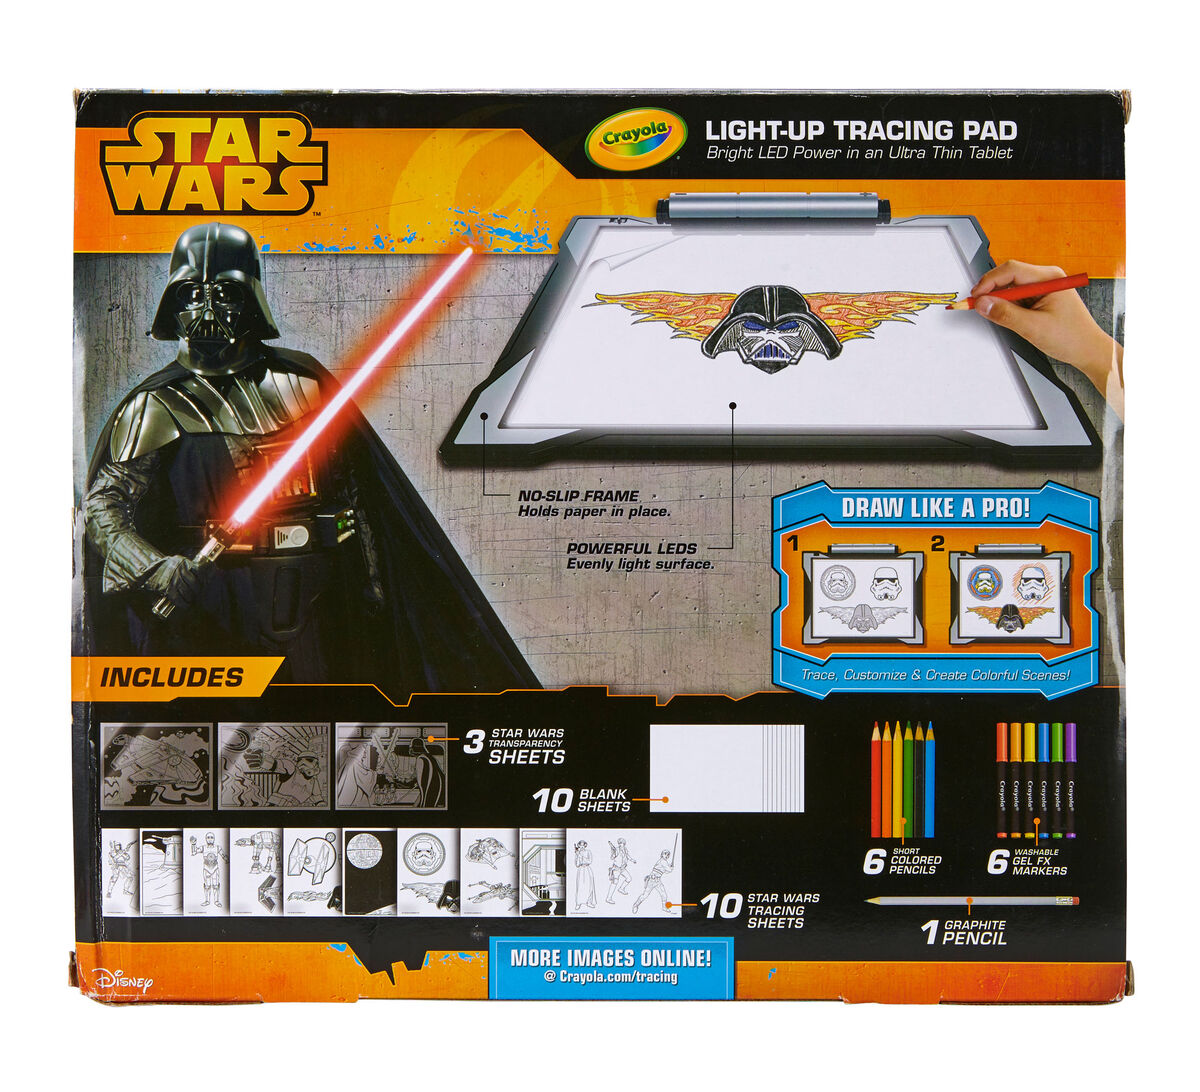 star wars light up tracing pad - Crayola Online Drawing